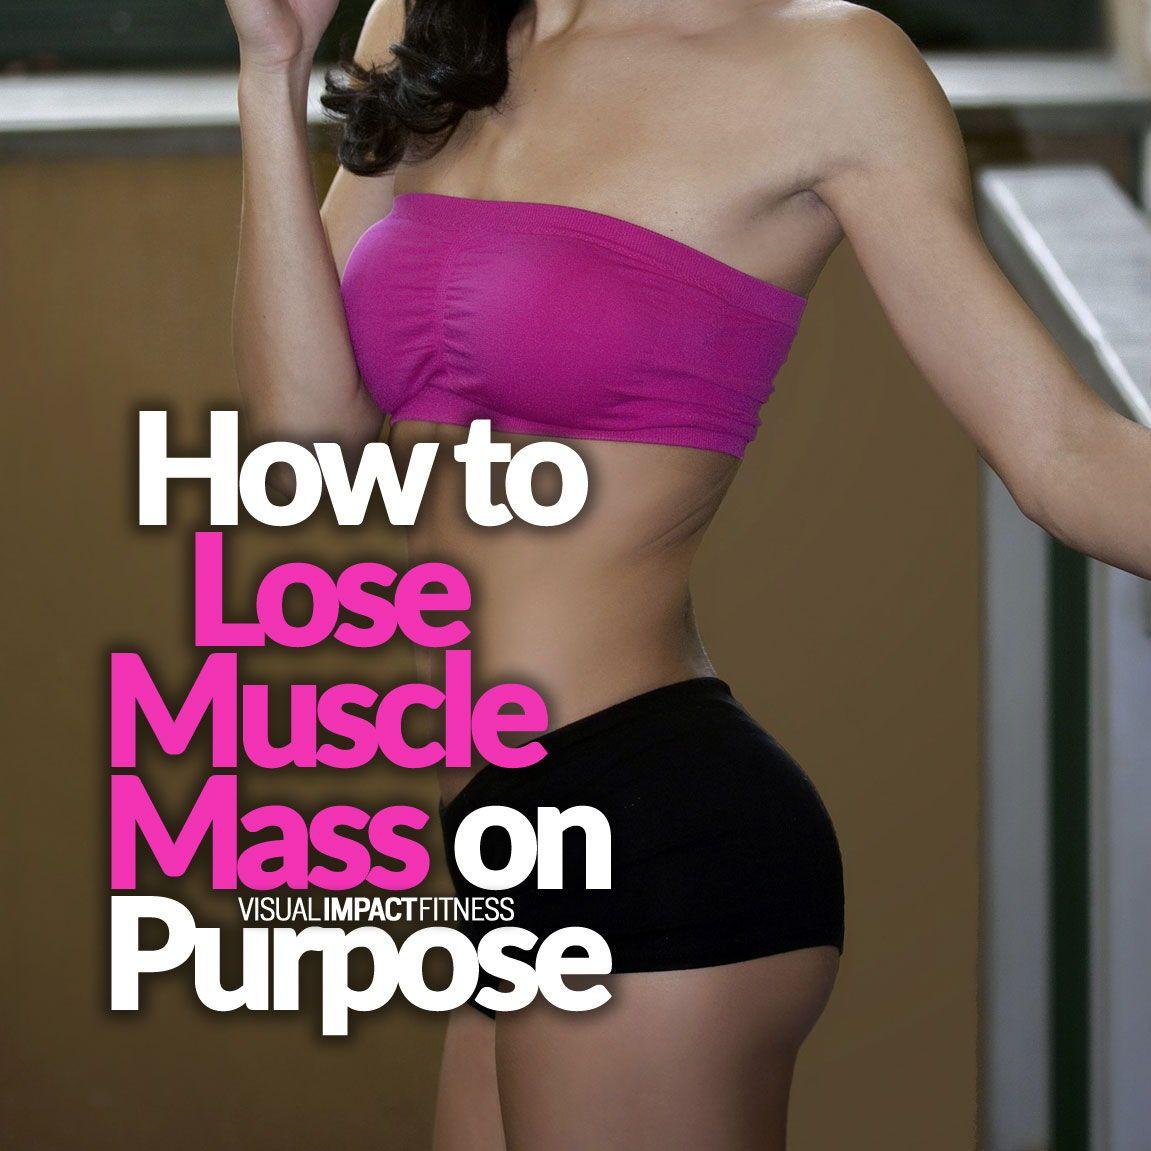 Best diet plan fat loss image 2